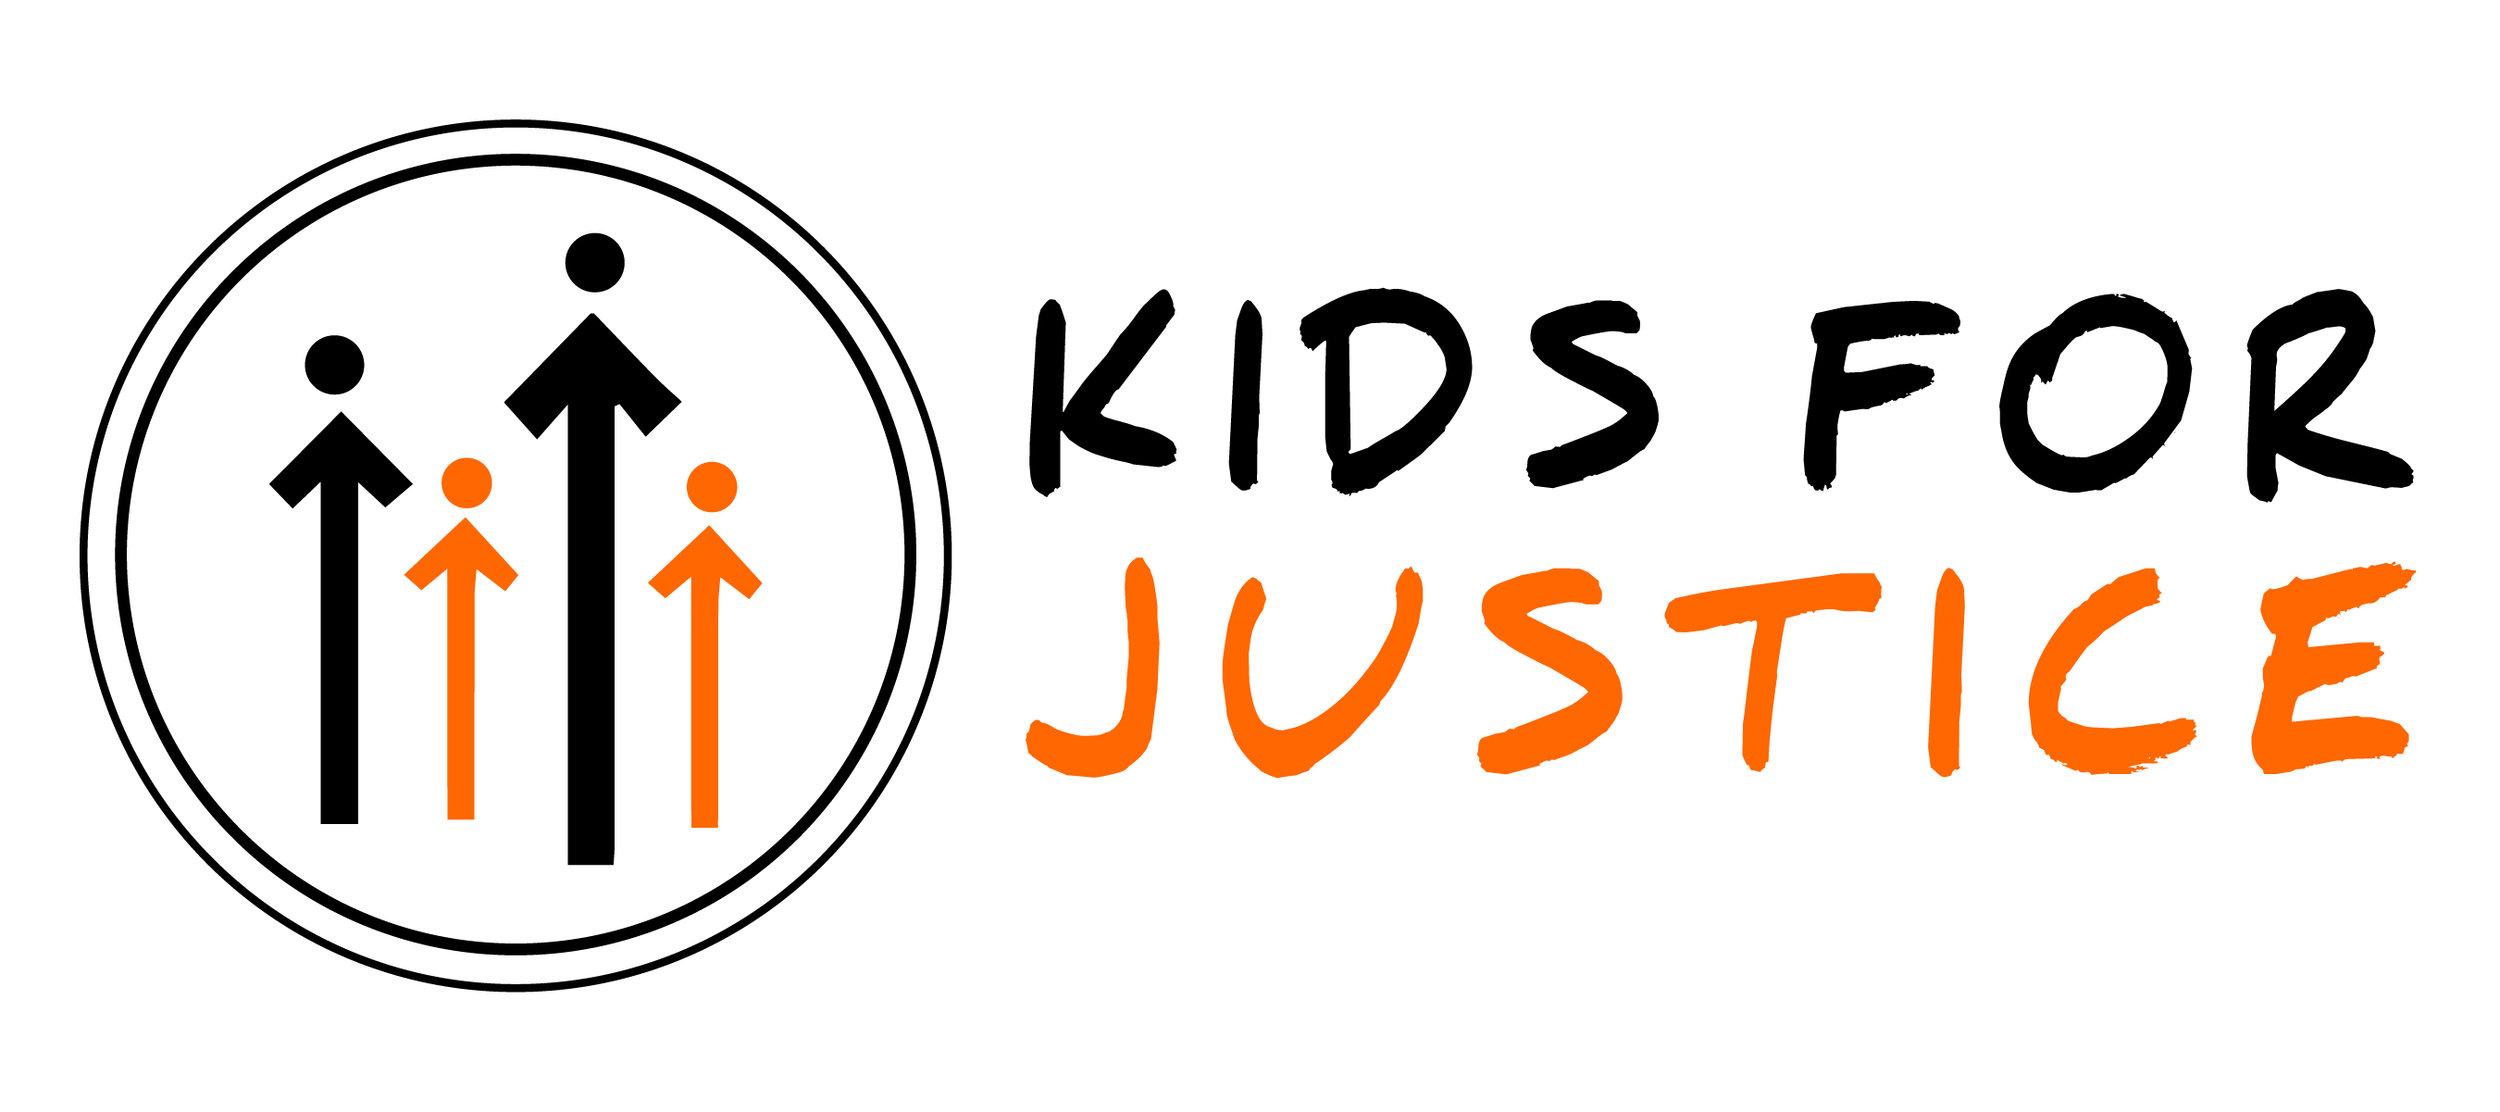 One17_KidsforJustice_Final_2018_new_Artboard 2.jpg